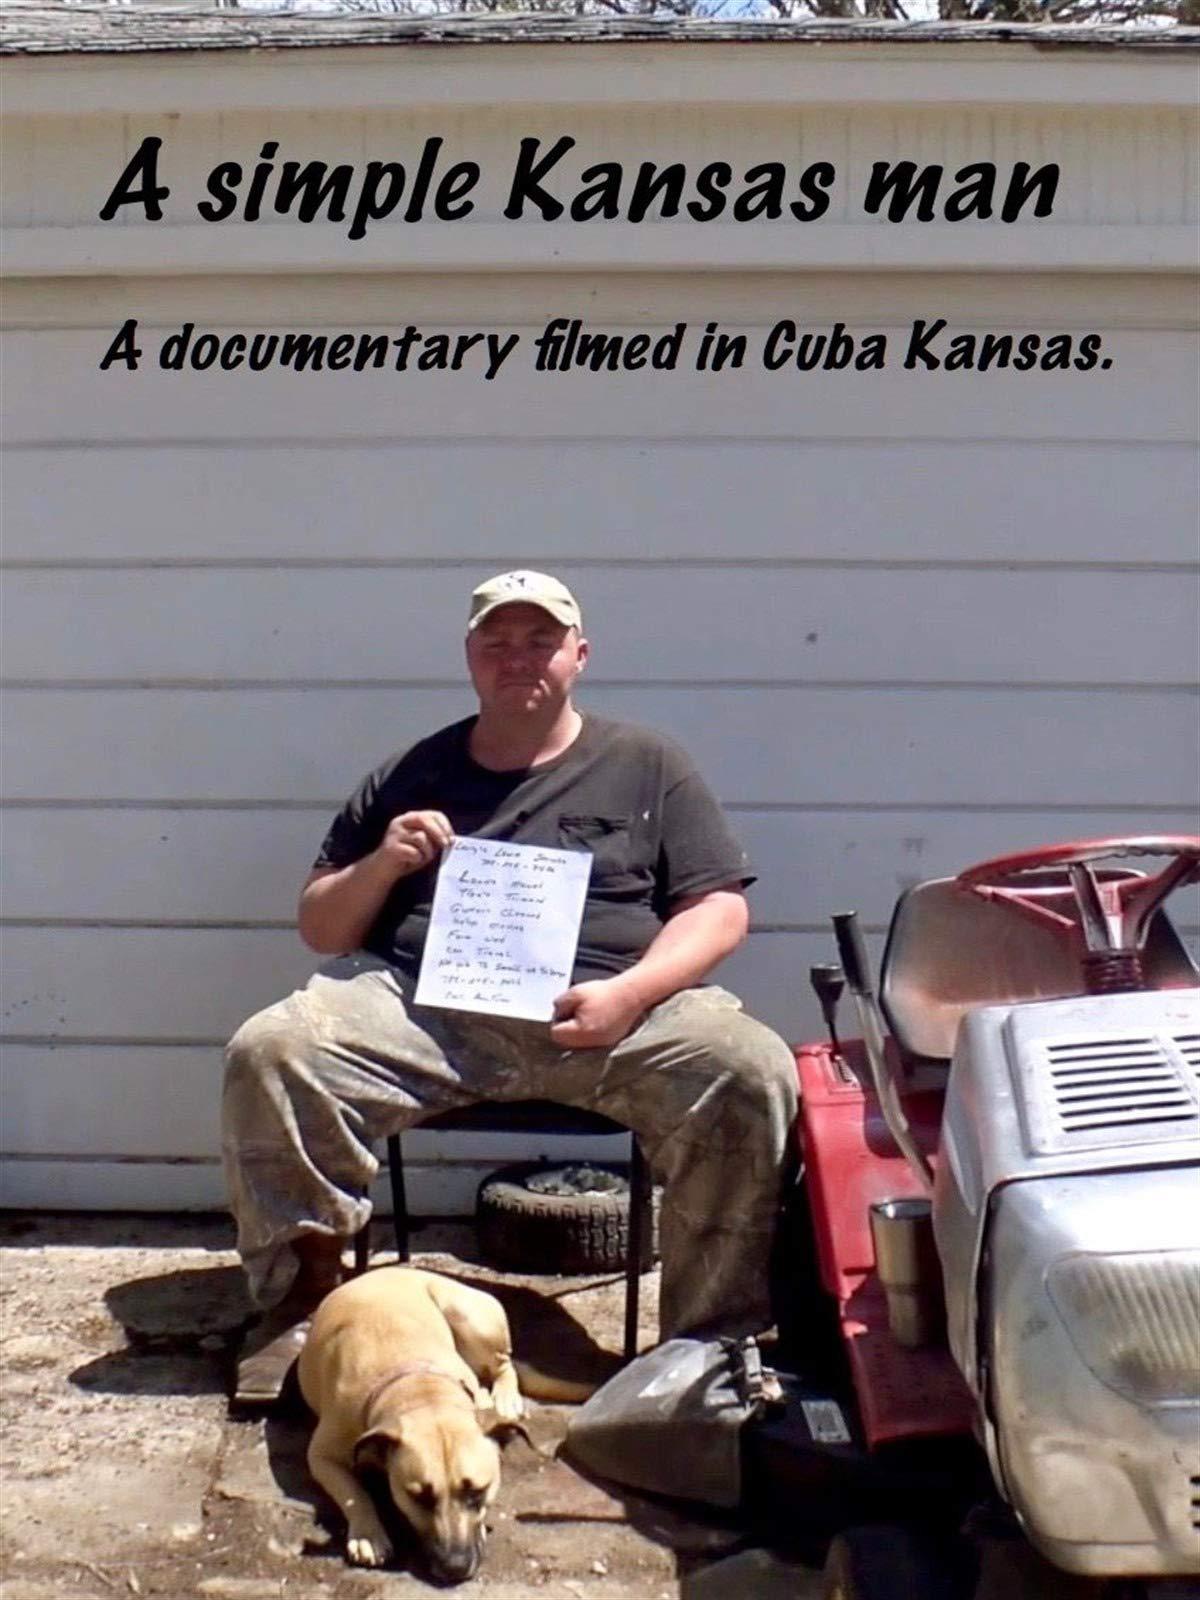 A simple Kansas man.